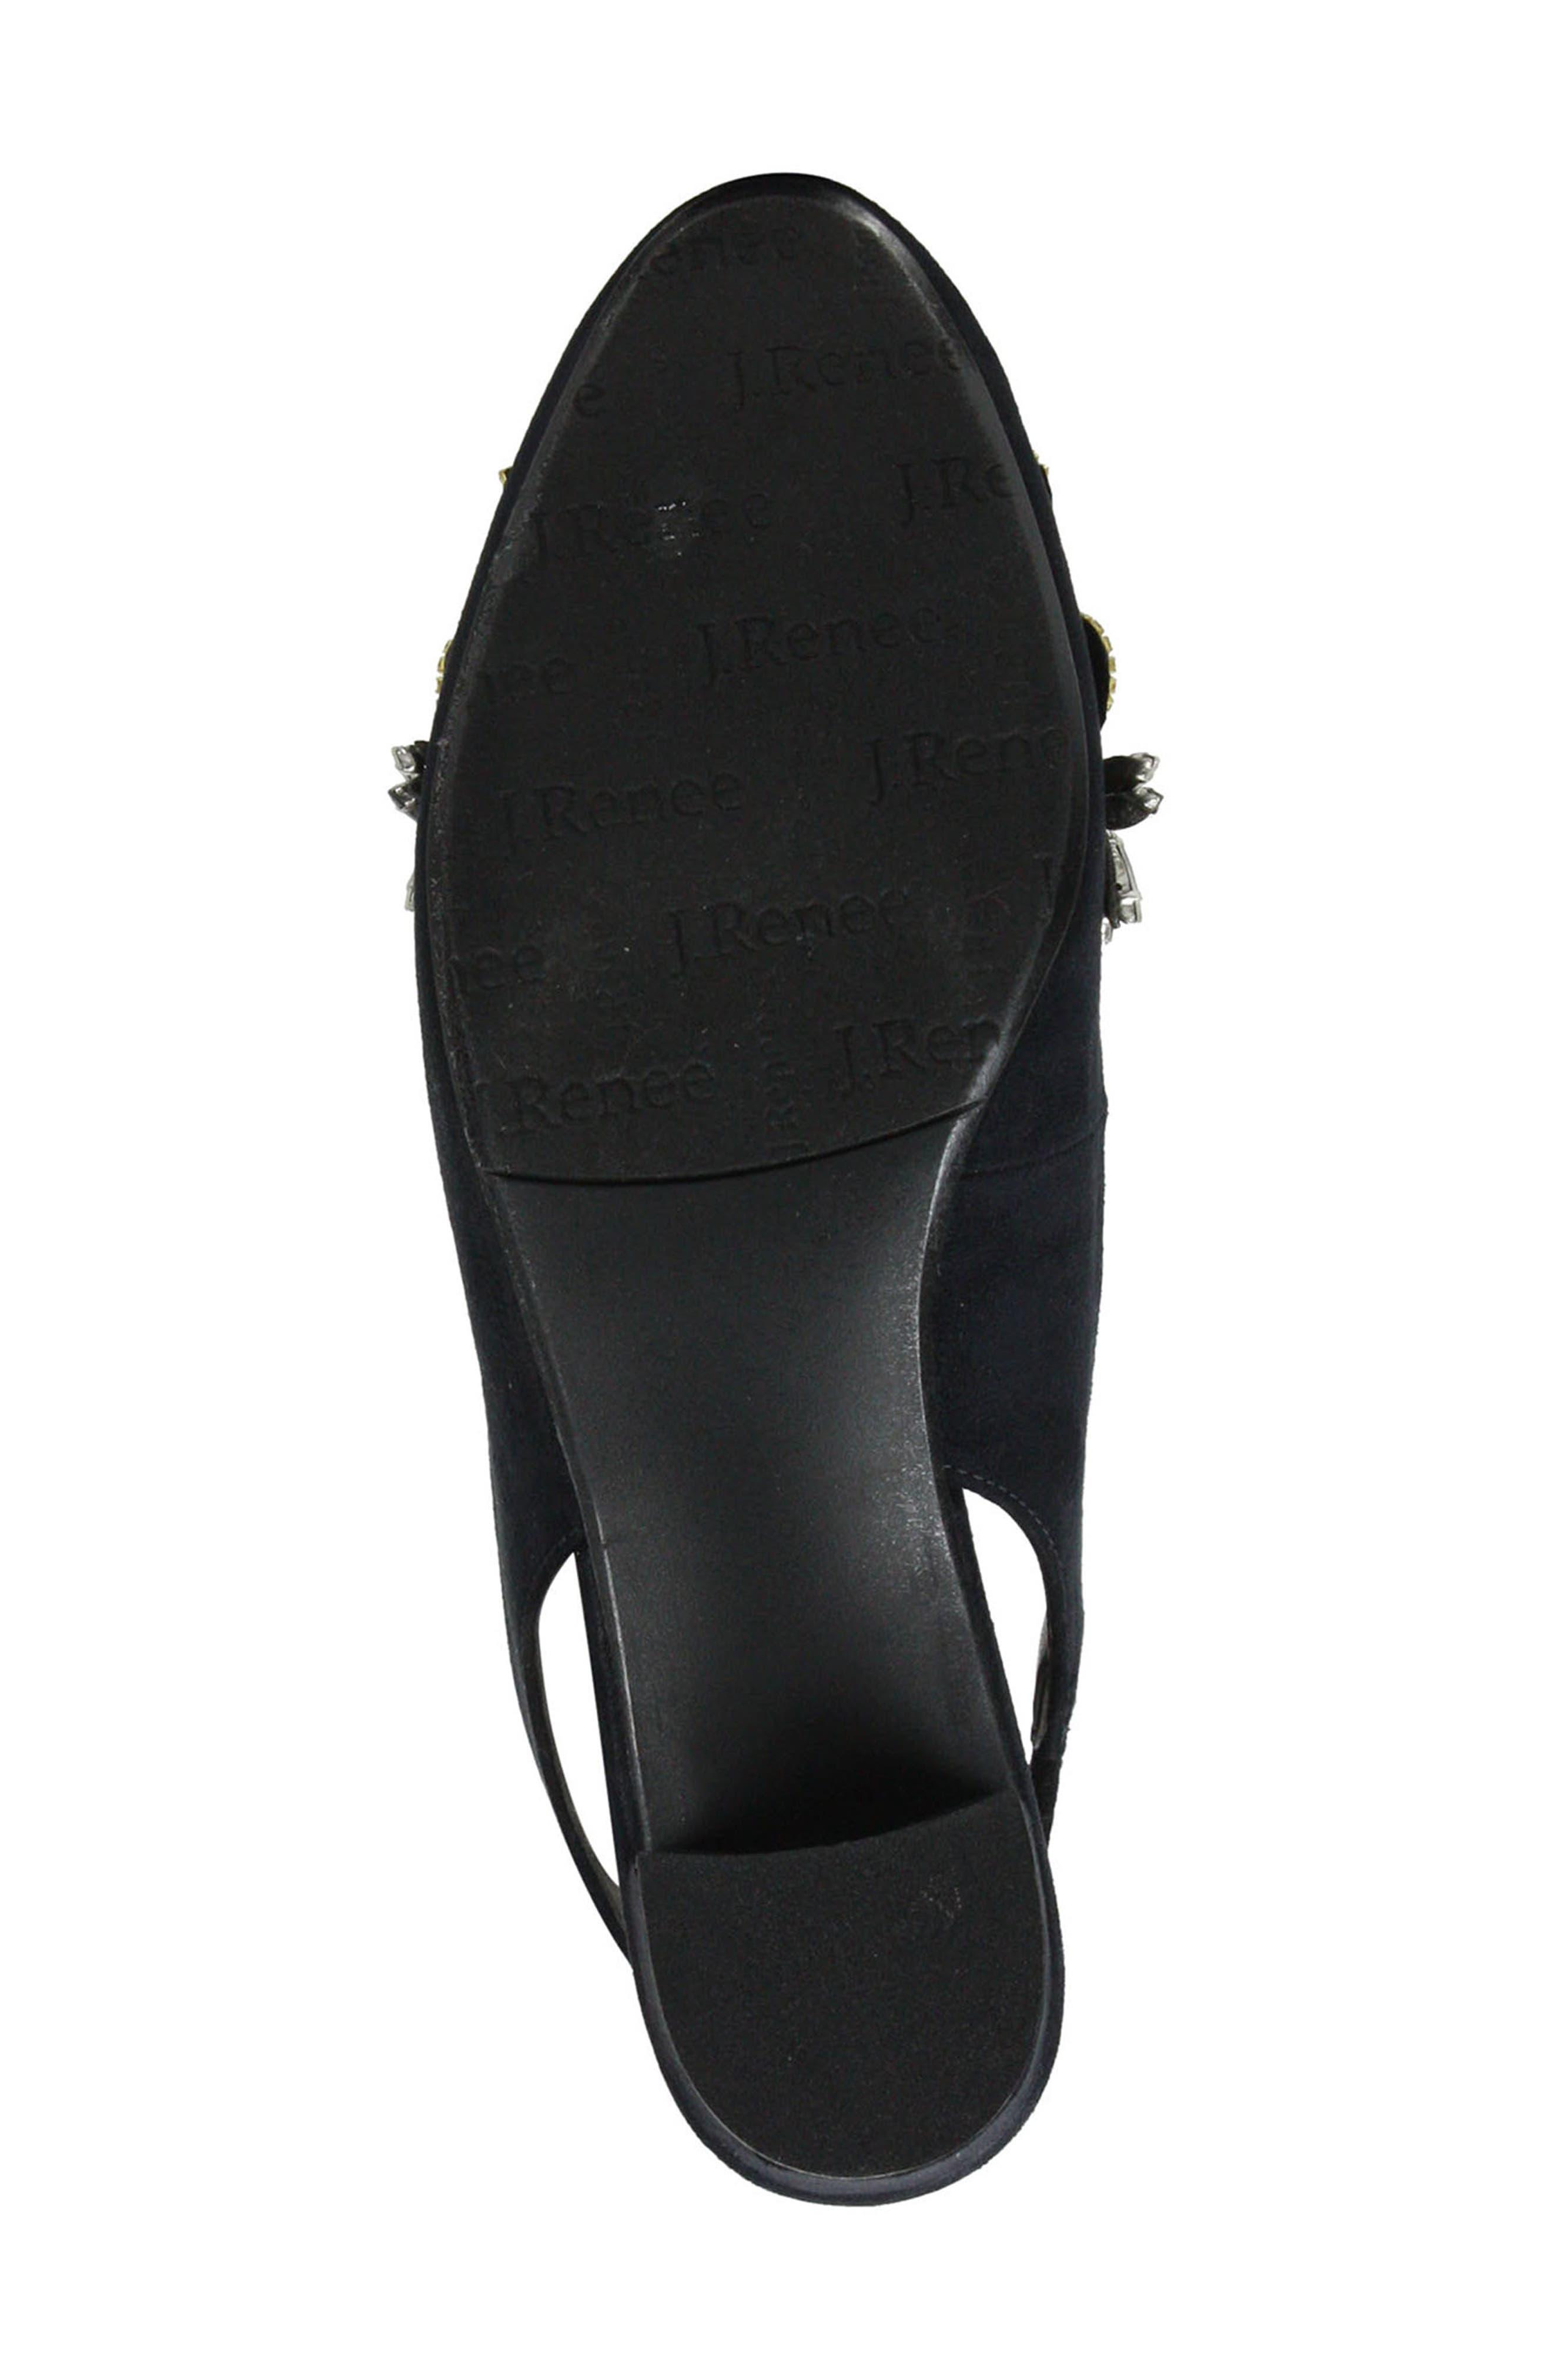 Delroy Embellished Slingback Pump,                             Alternate thumbnail 6, color,                             BLACK SUEDE/ WHITE PEARLS